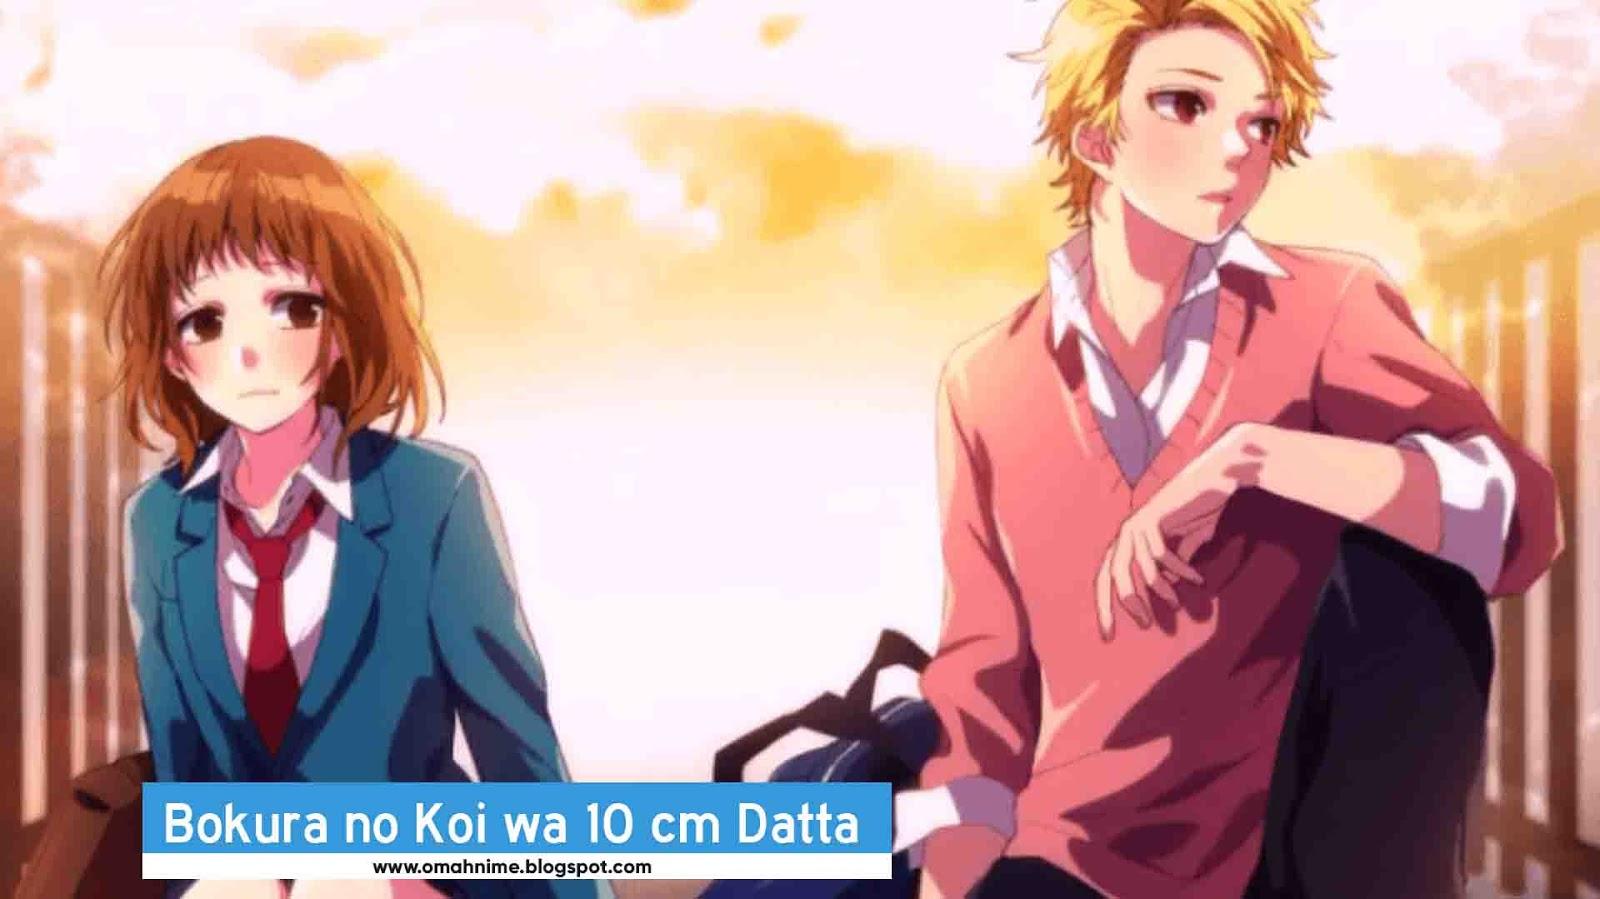 Itsudatte bokura no koi wa 10 cm datta bd batch subtitle indonesia